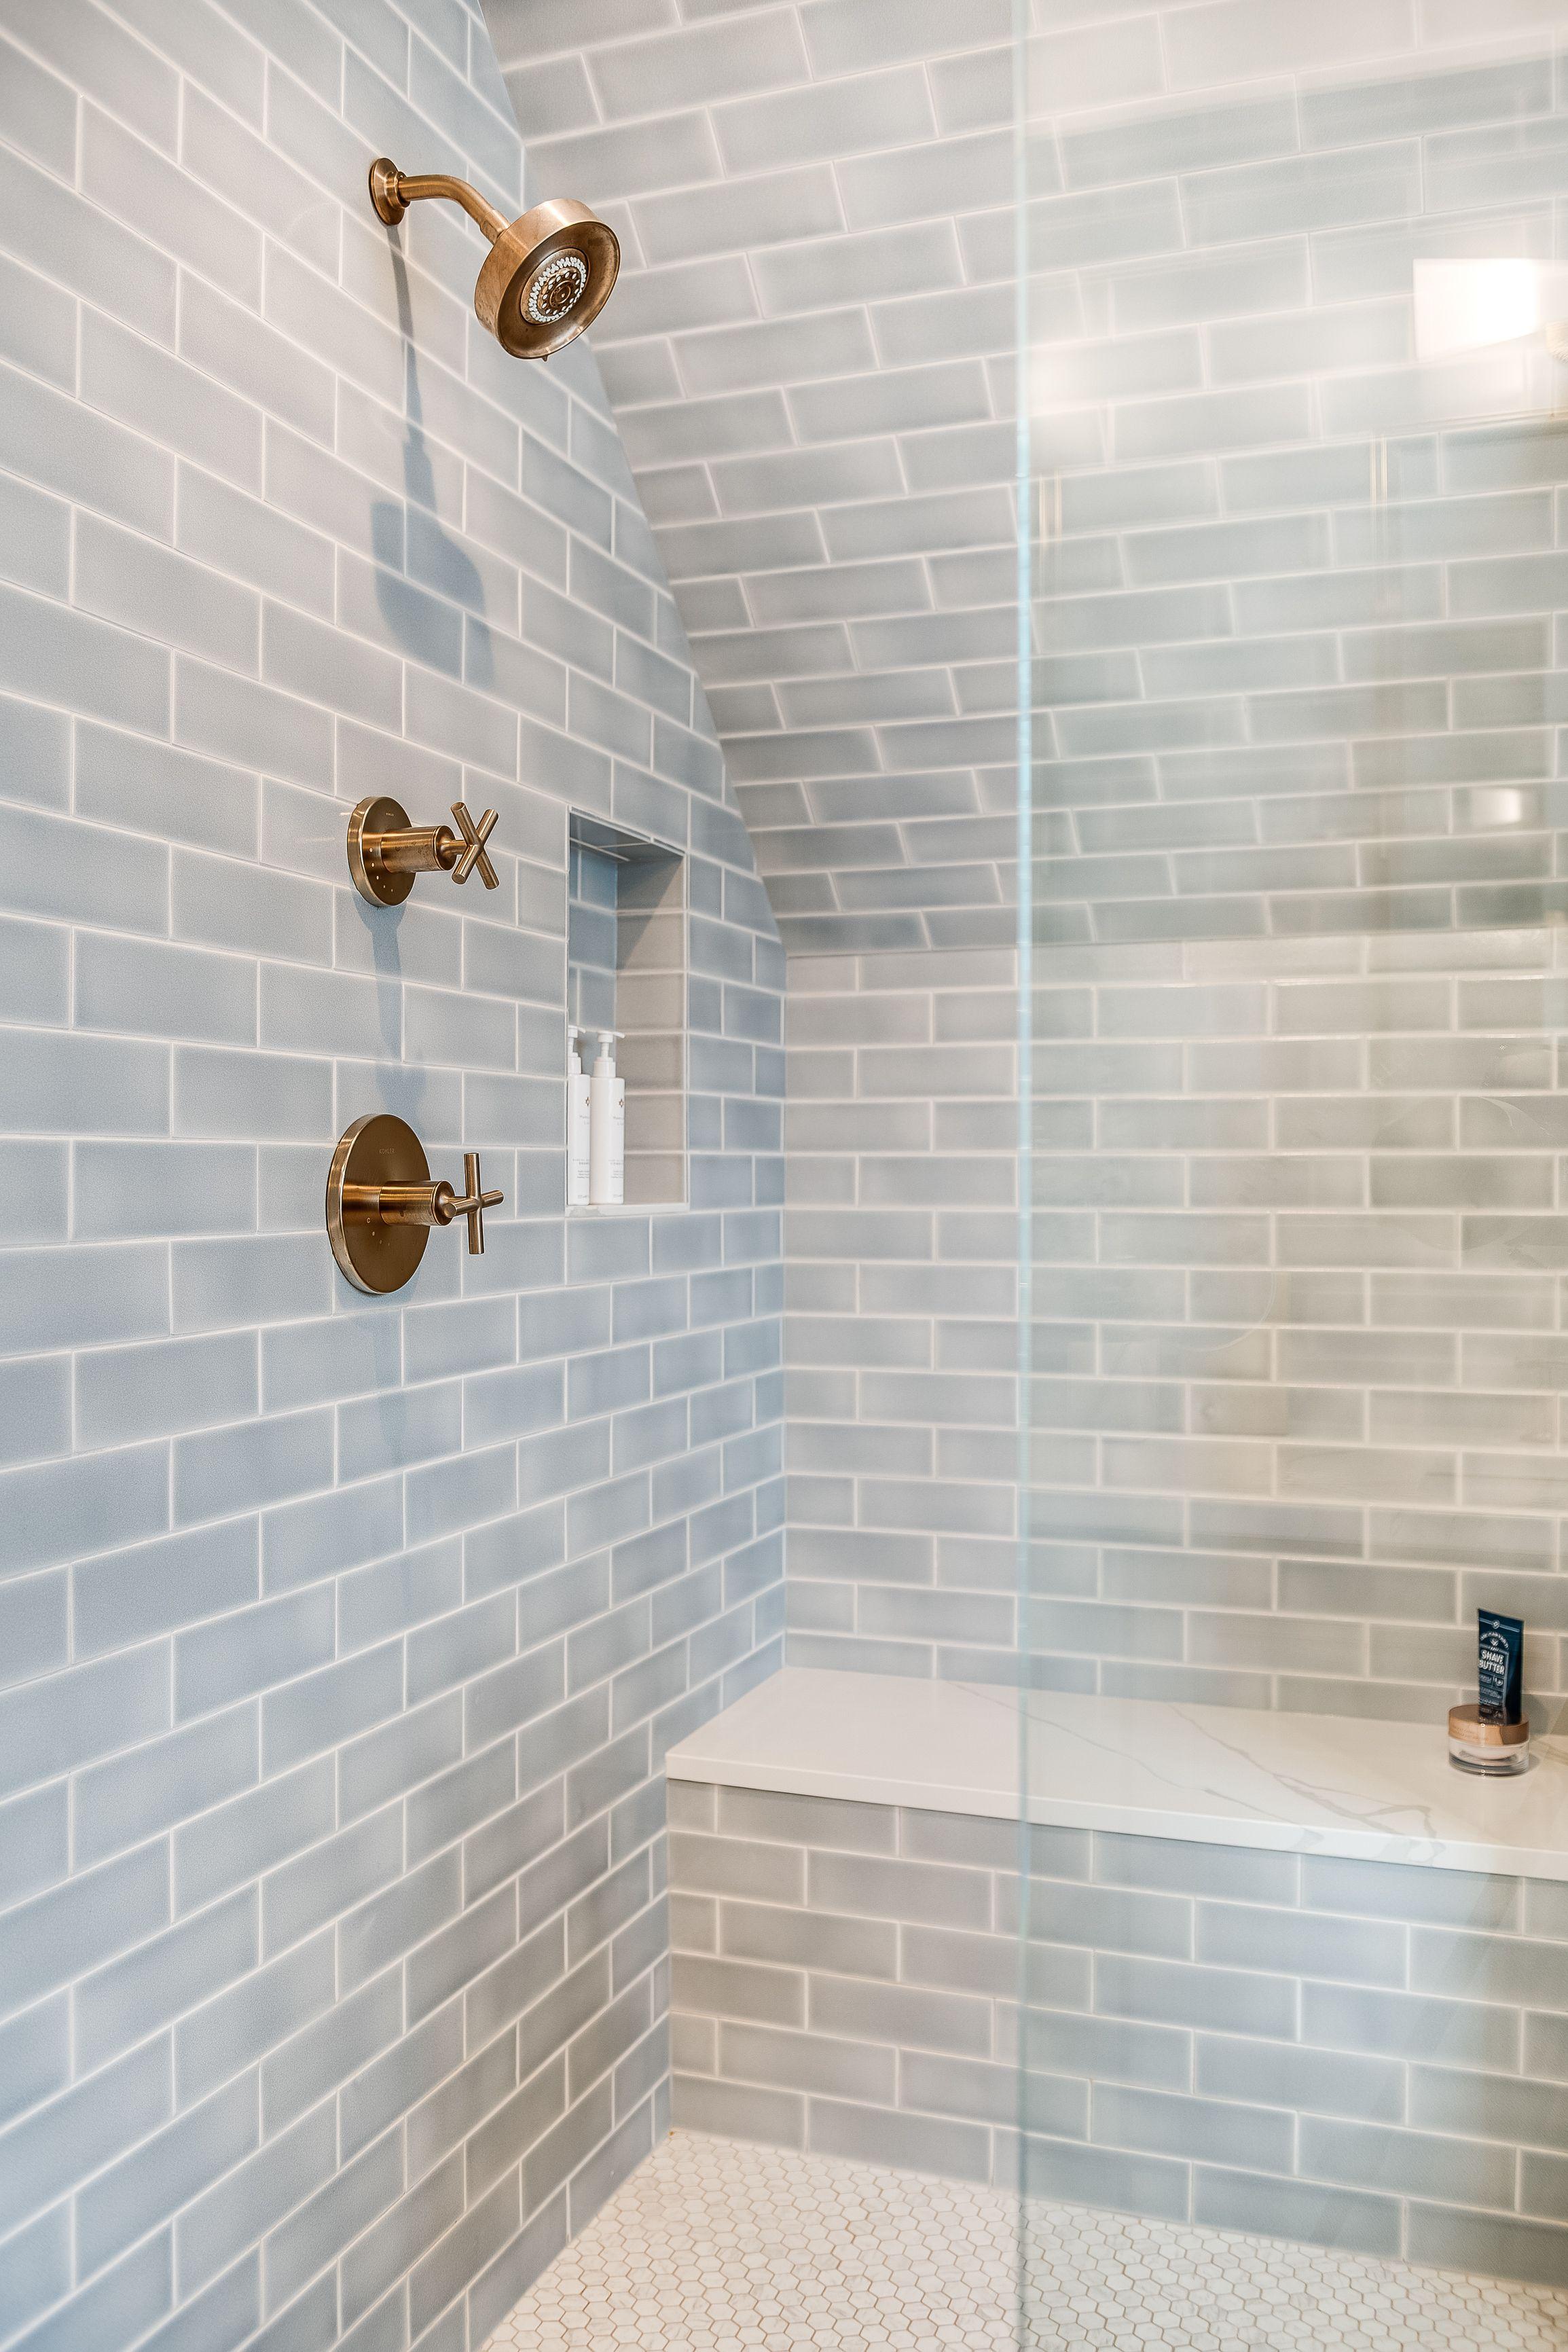 2018 Img Q2 Hi Res Rights Fio Creative Photo Cara Alyn Interiors Web Hi Resolution Bathroom Shower S Bathrooms Remodel Elegant Bathroom Bathroom Remodel Master